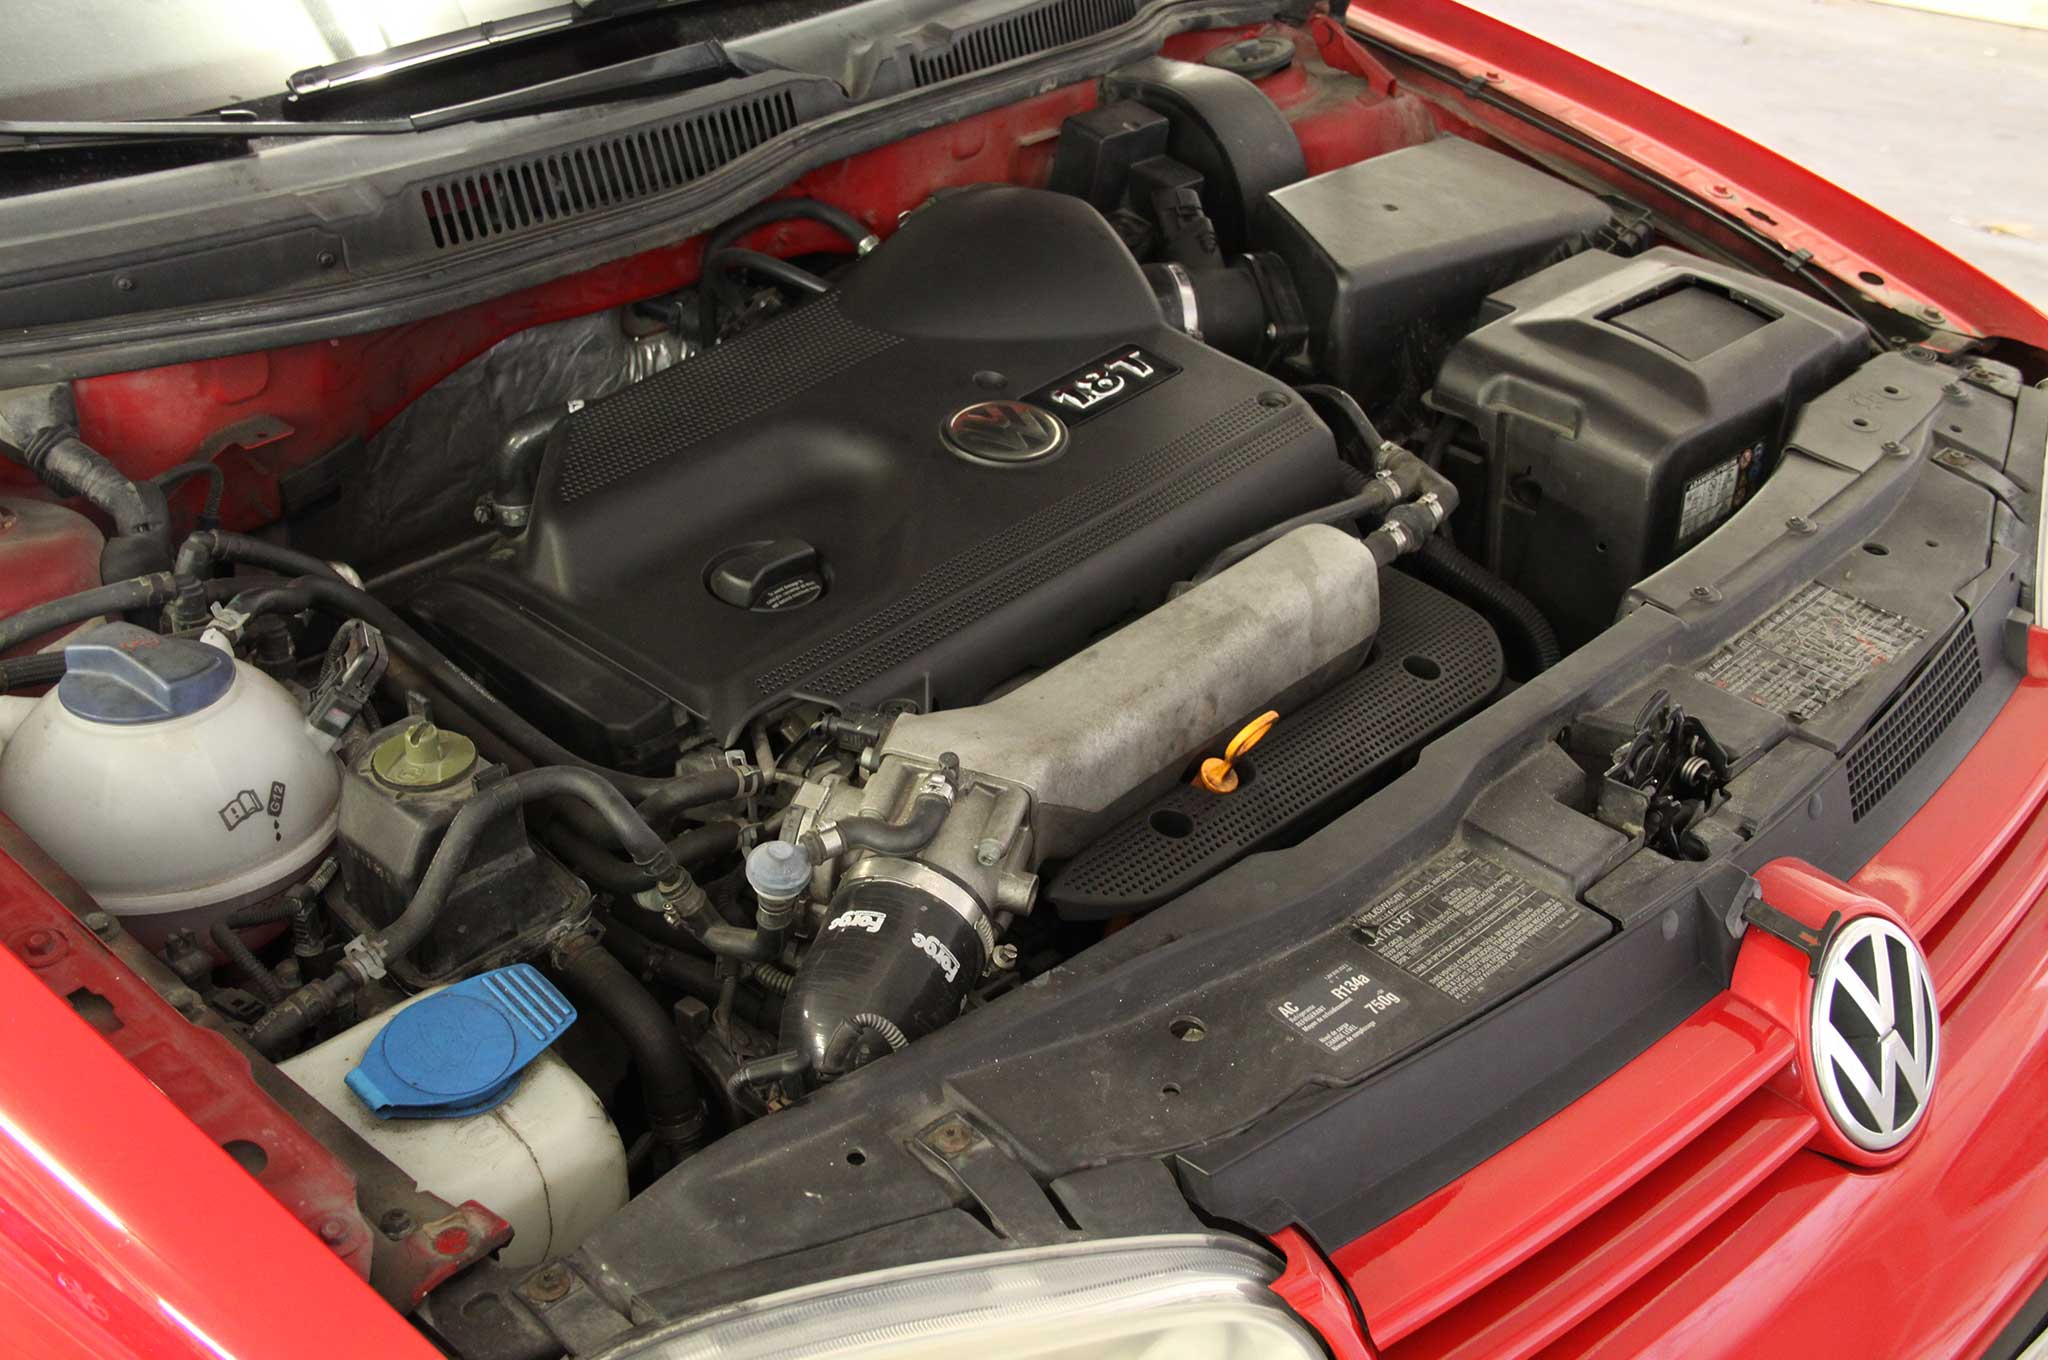 Vw Jetta Vacuum Line Diagram On 2001 Volkswagen Golf Gl Engine